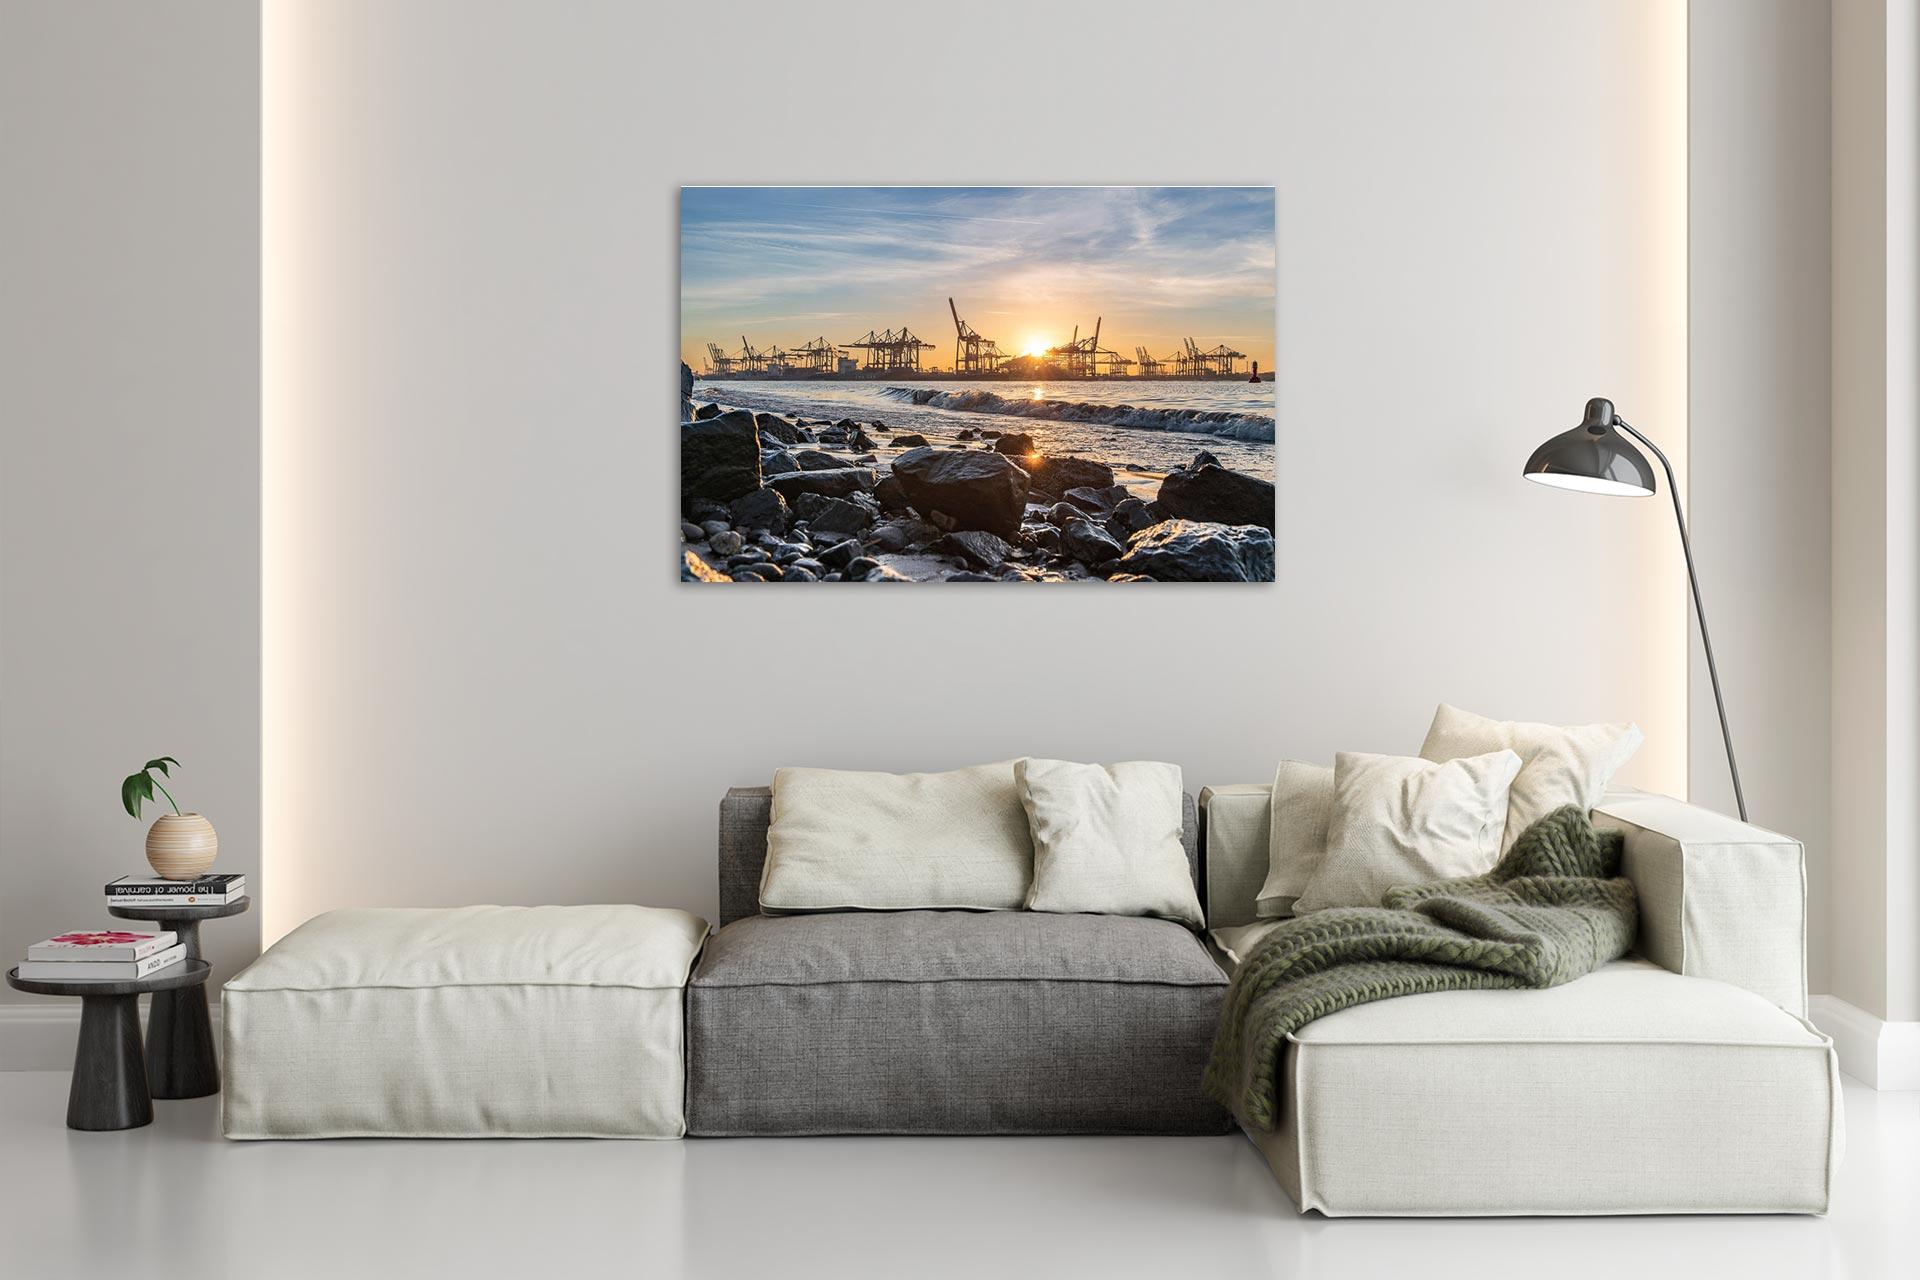 LCW276-elbkiesel-hamburg-wandbild-bild-auf-leinwand-acrylglas-aludibond-wohnzimmer